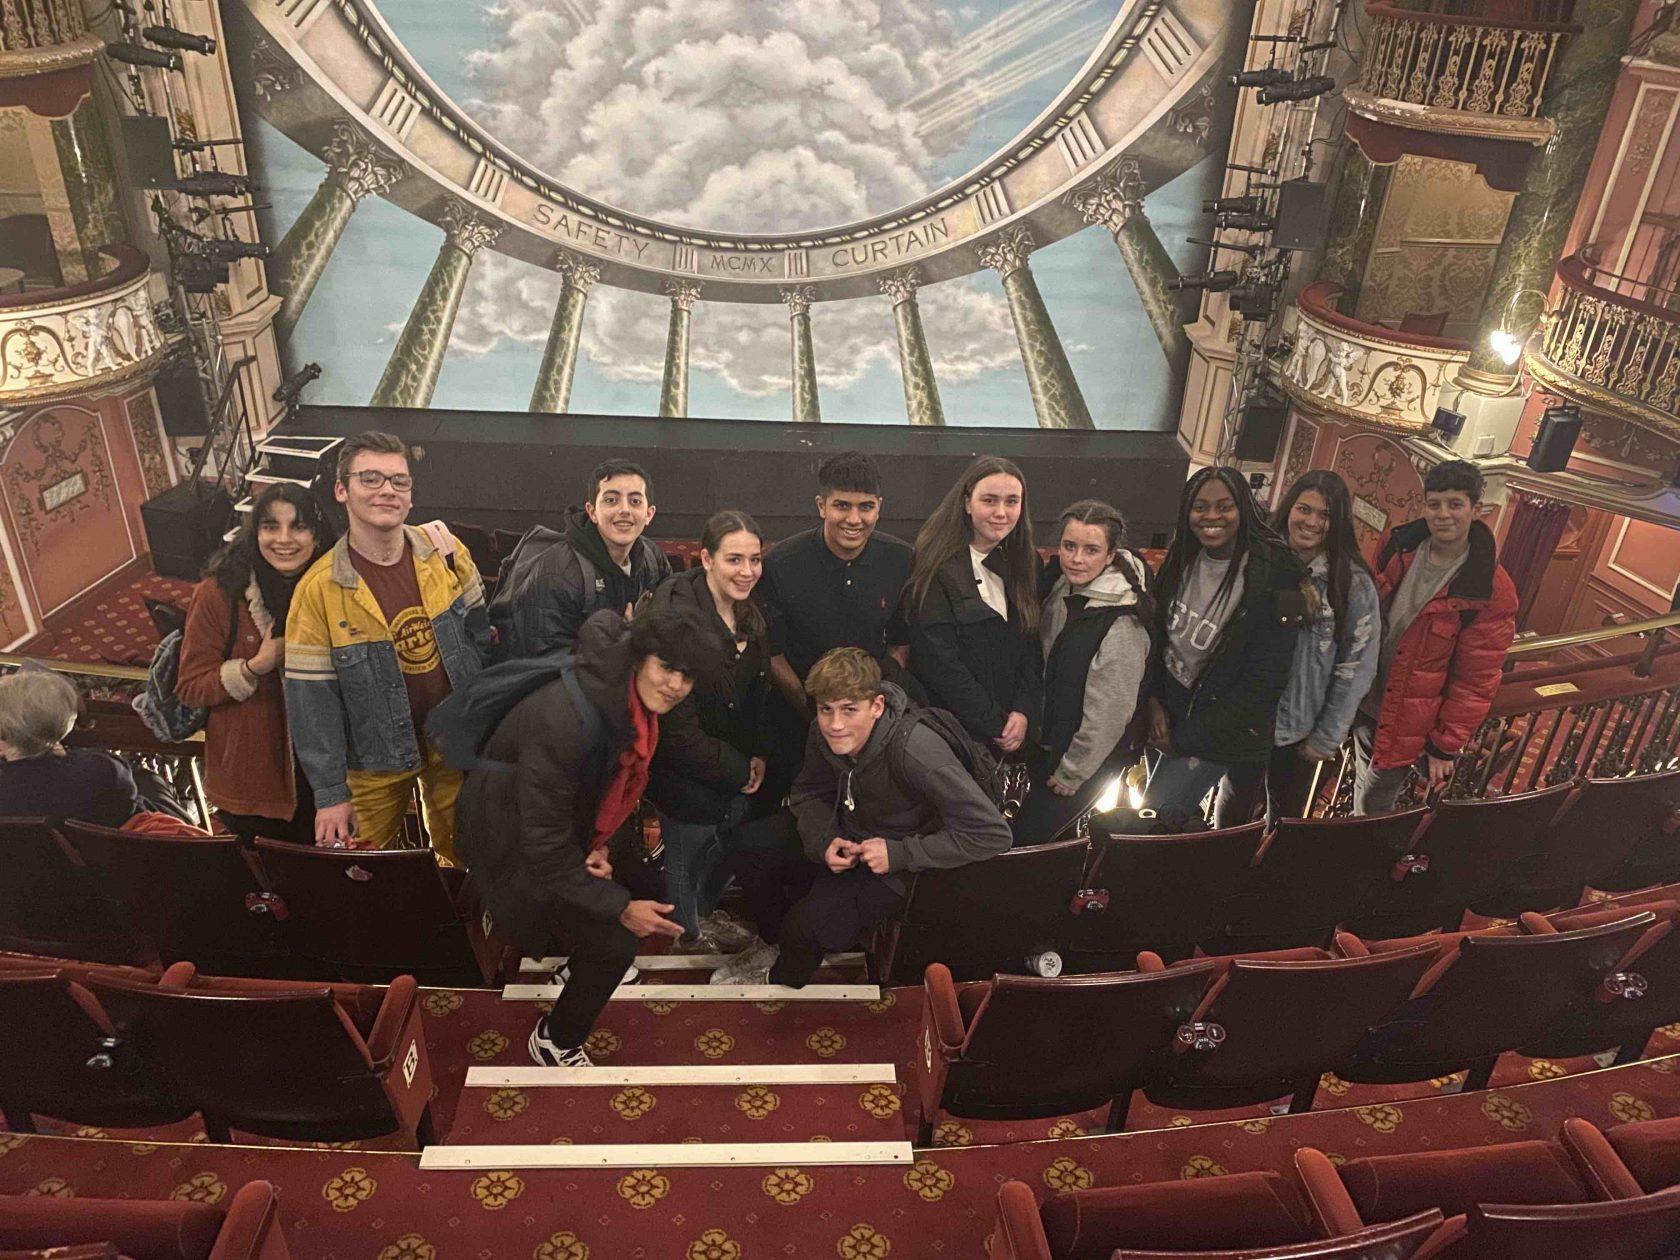 'An Inspector Calls' Year 10 Theatre Trip